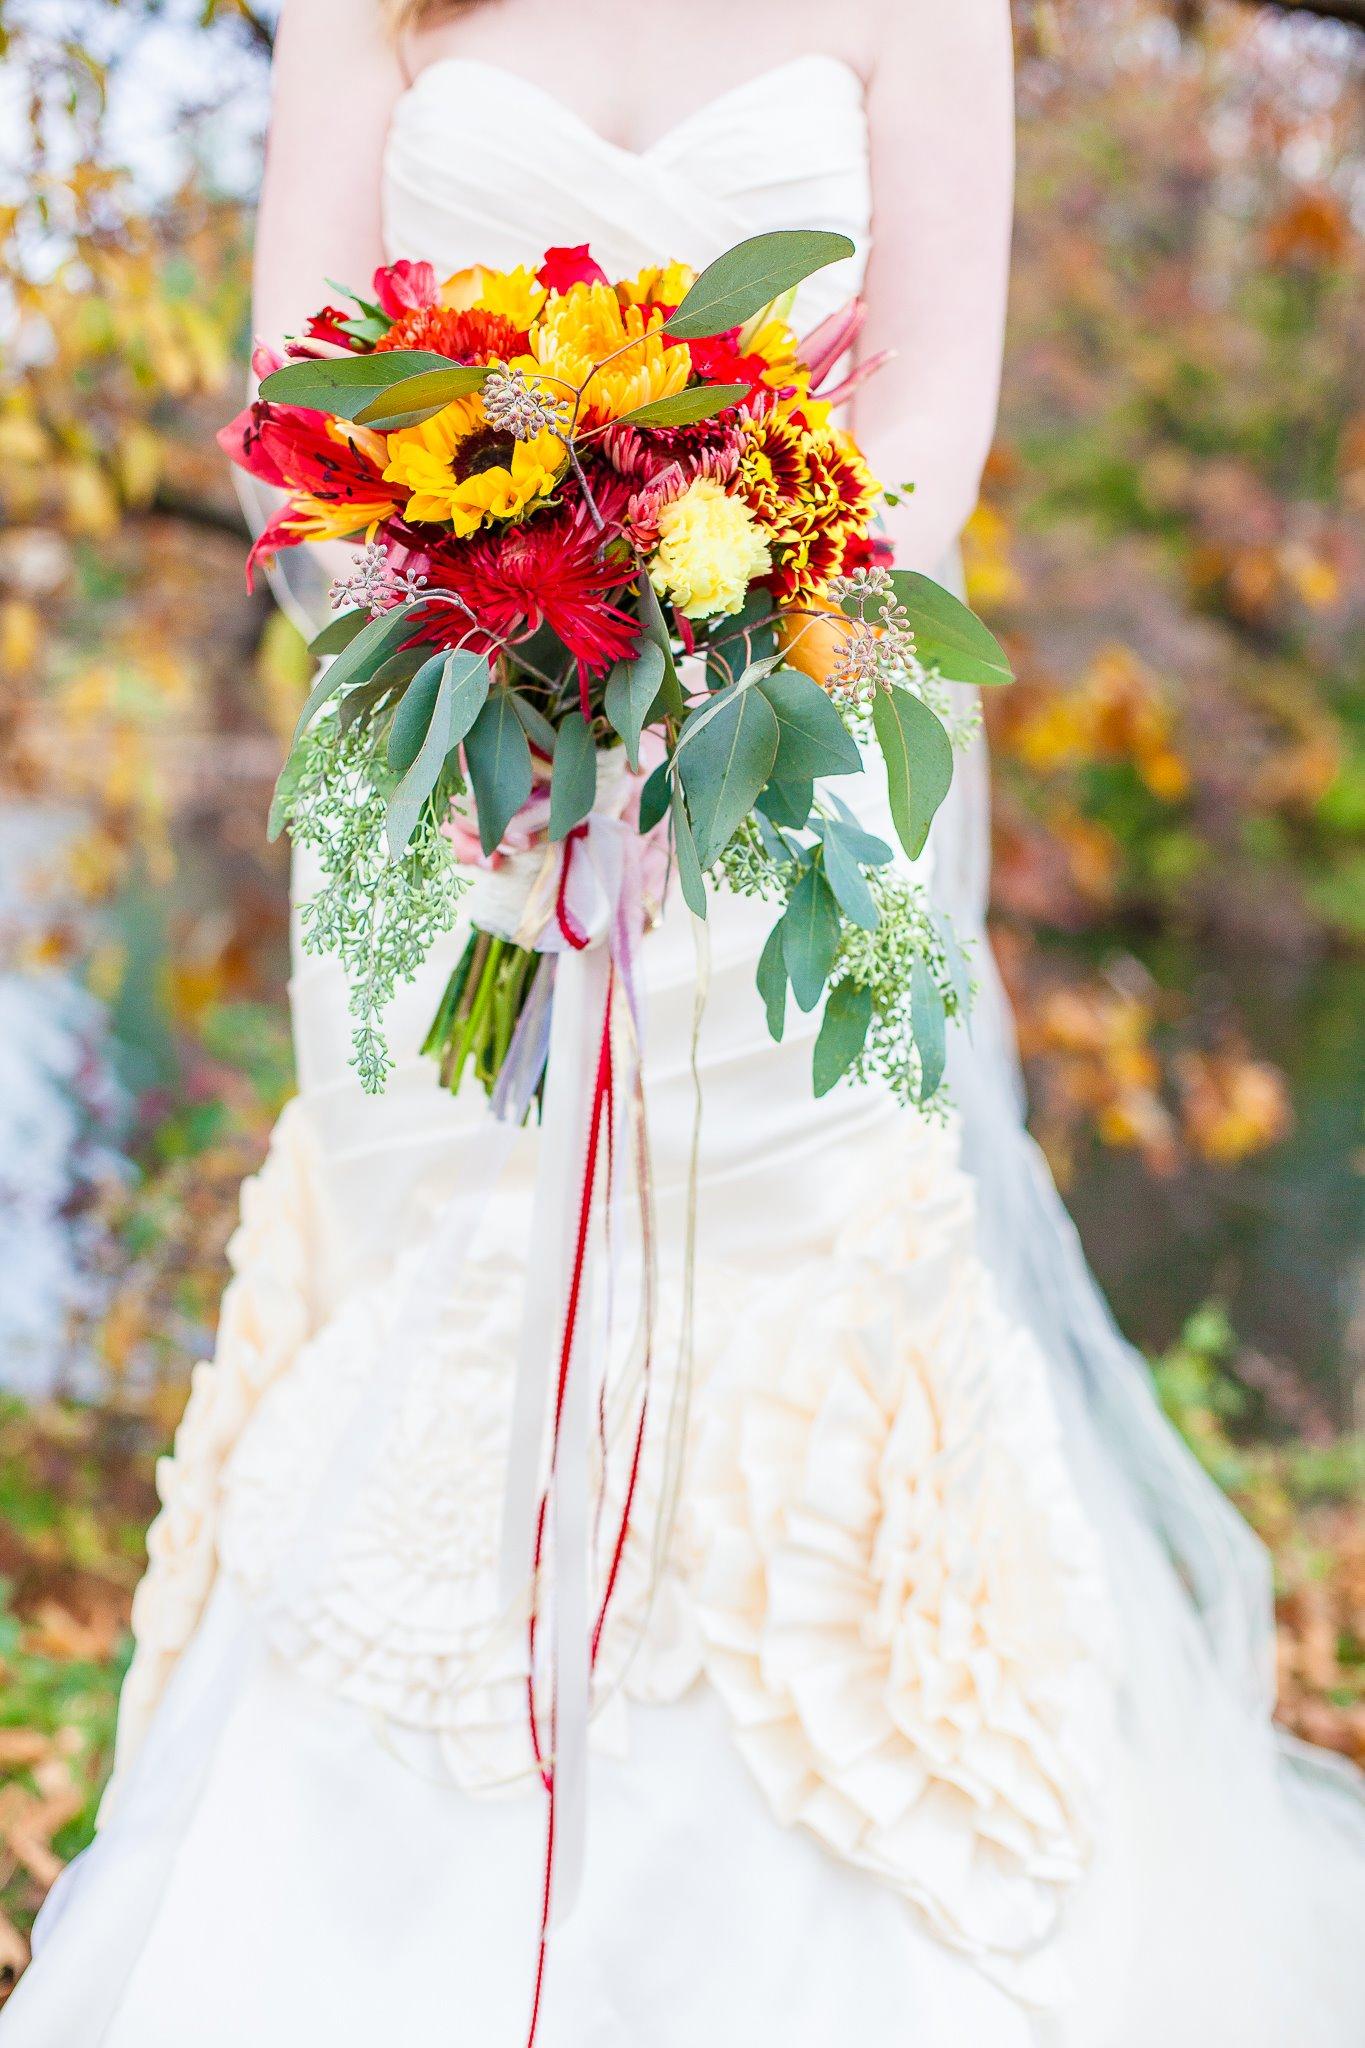 ACStudio_Styled_Autumn-Bride (2).jpg